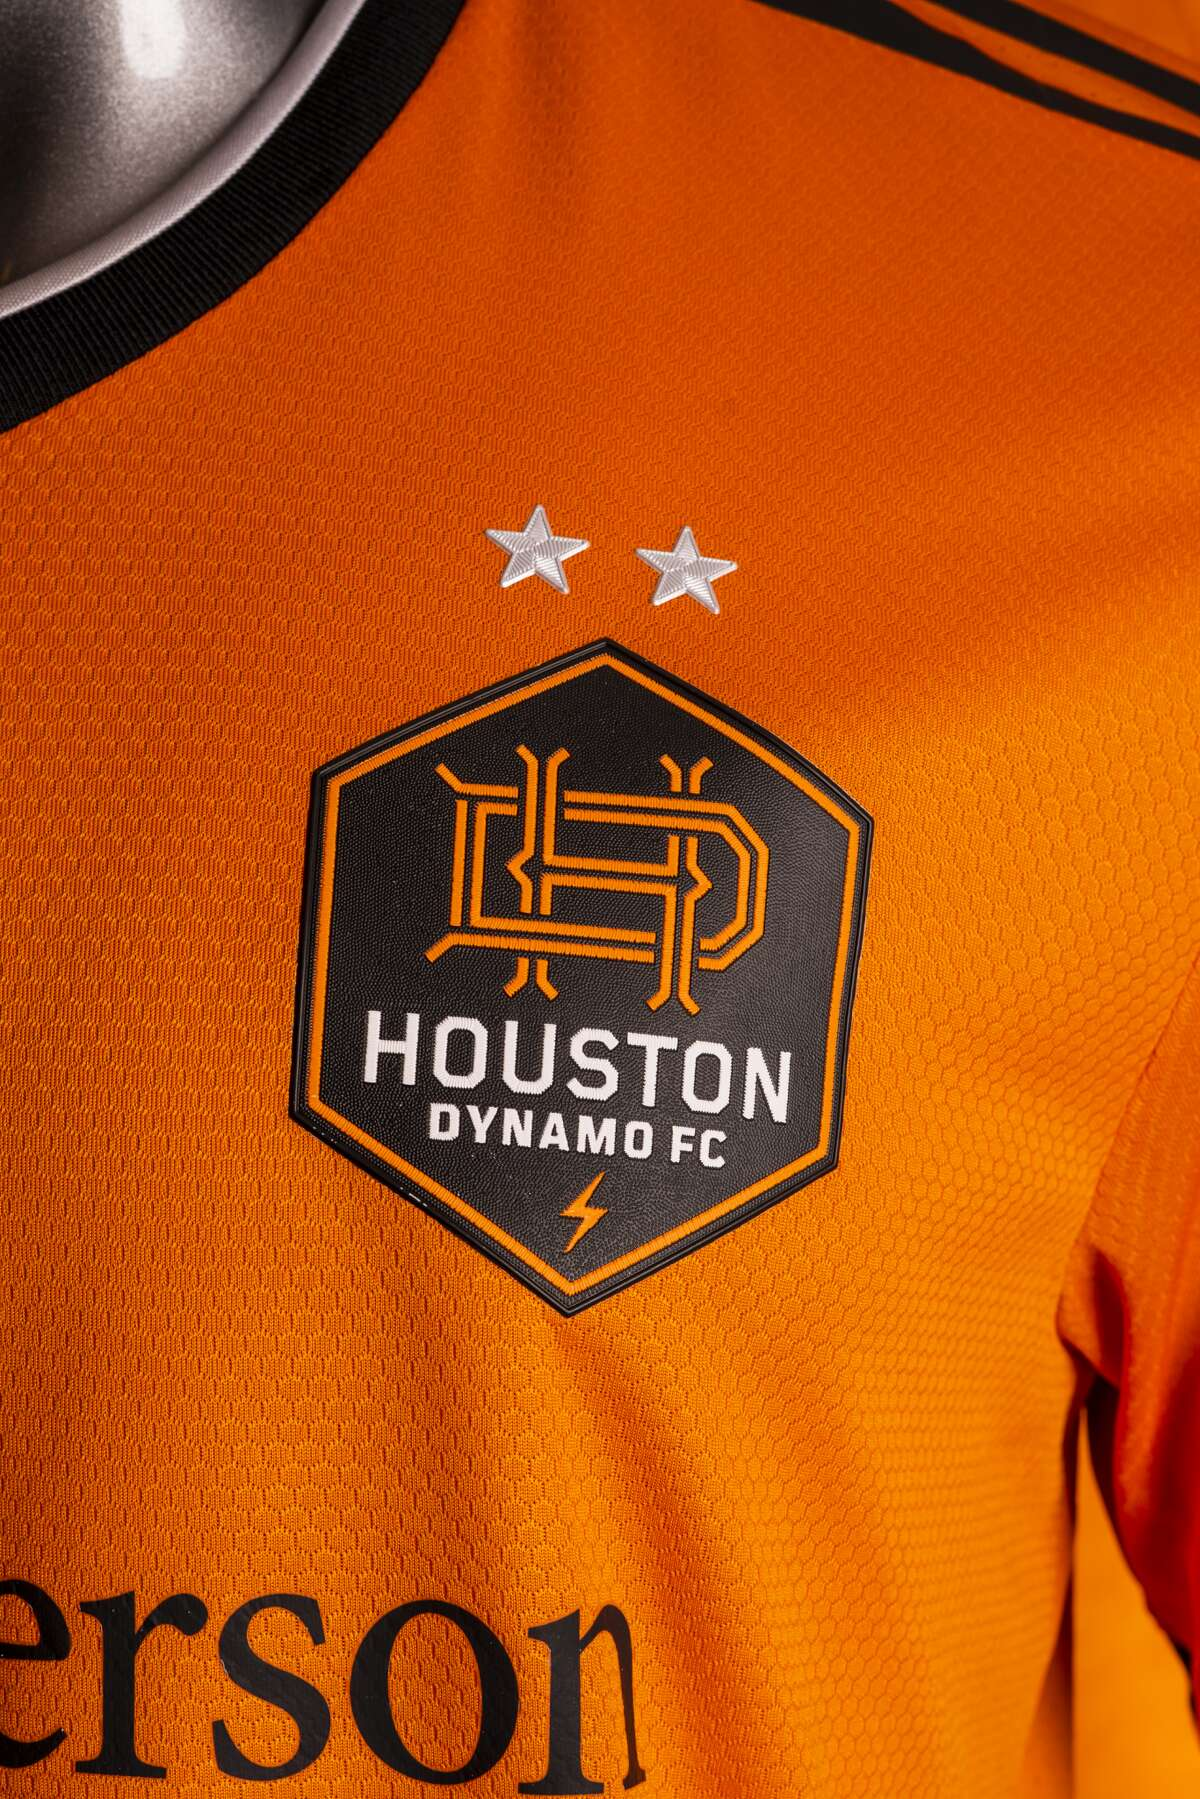 The Dynamo's new uniform.